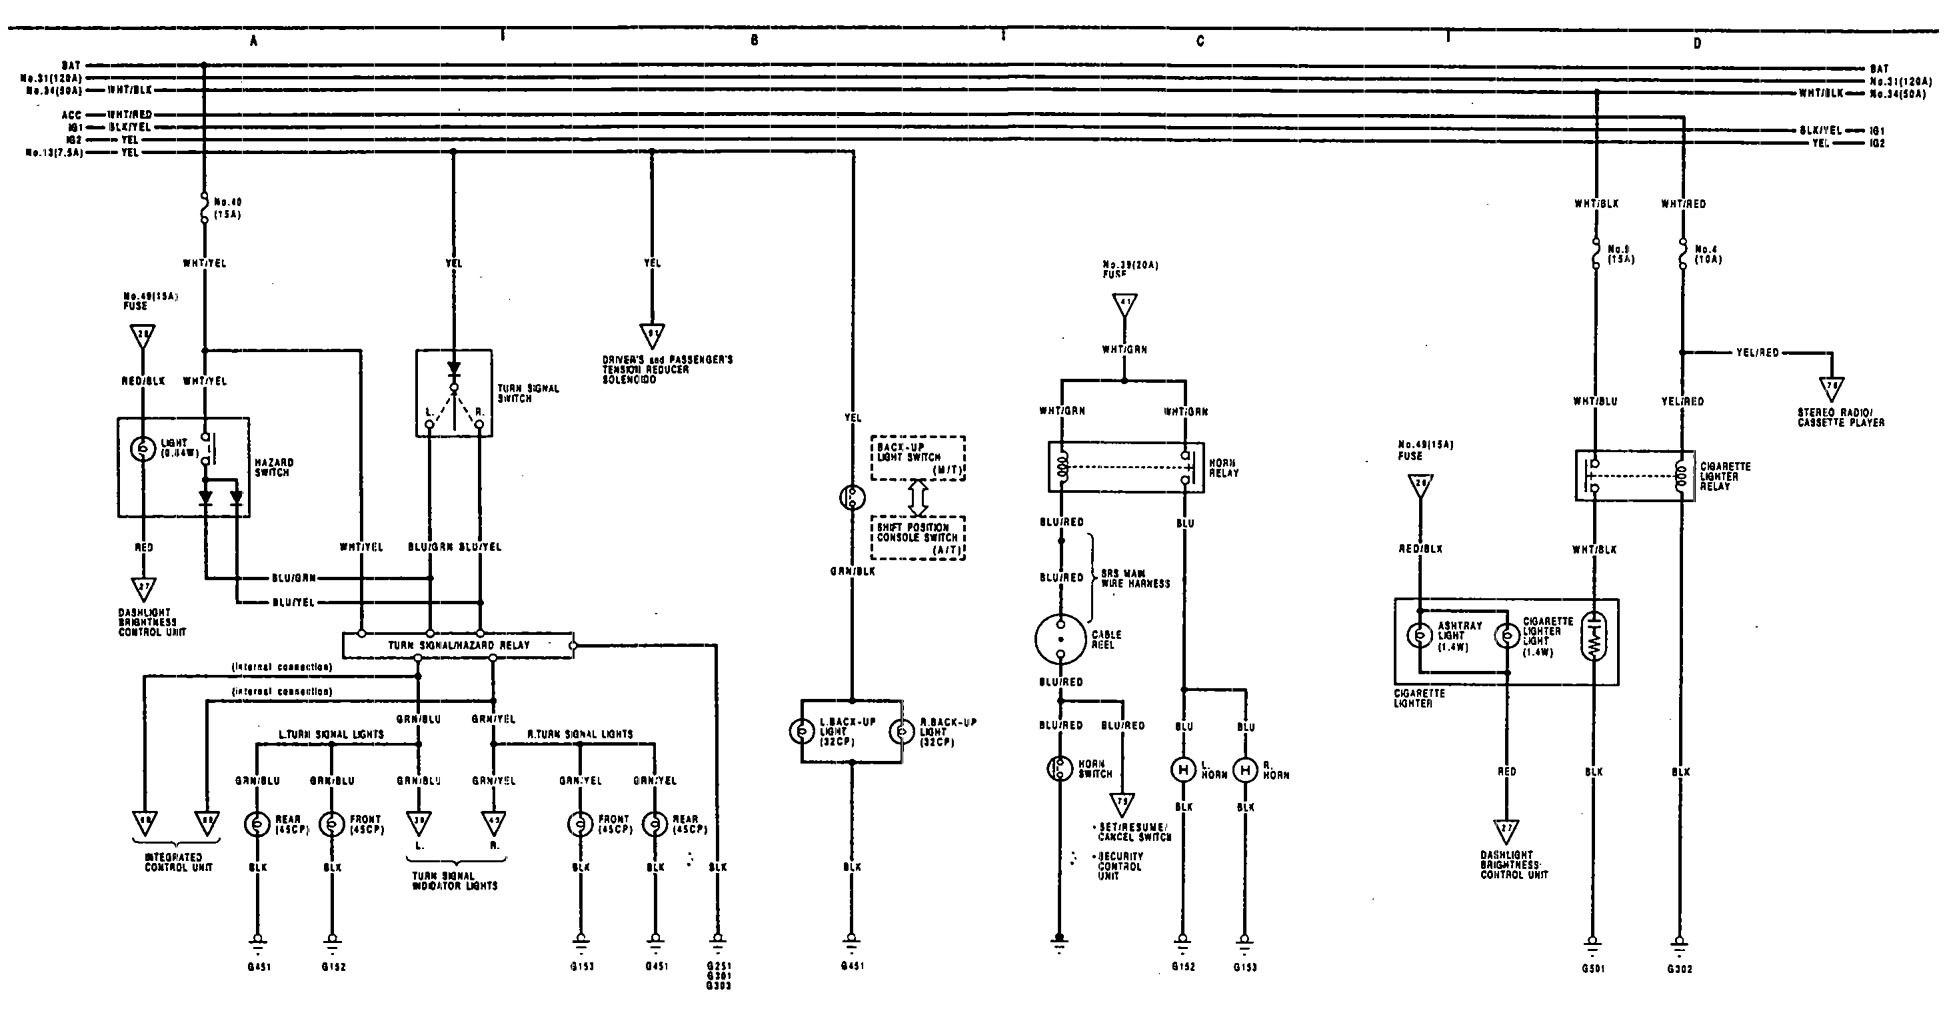 [SCHEMATICS_4JK]  Acura Legend (1991 - 1993) - wiring diagram - turn signal lamp -  Carknowledge.info | 1993 Acura Legend Wiring Diagram |  | Carknowledge.info